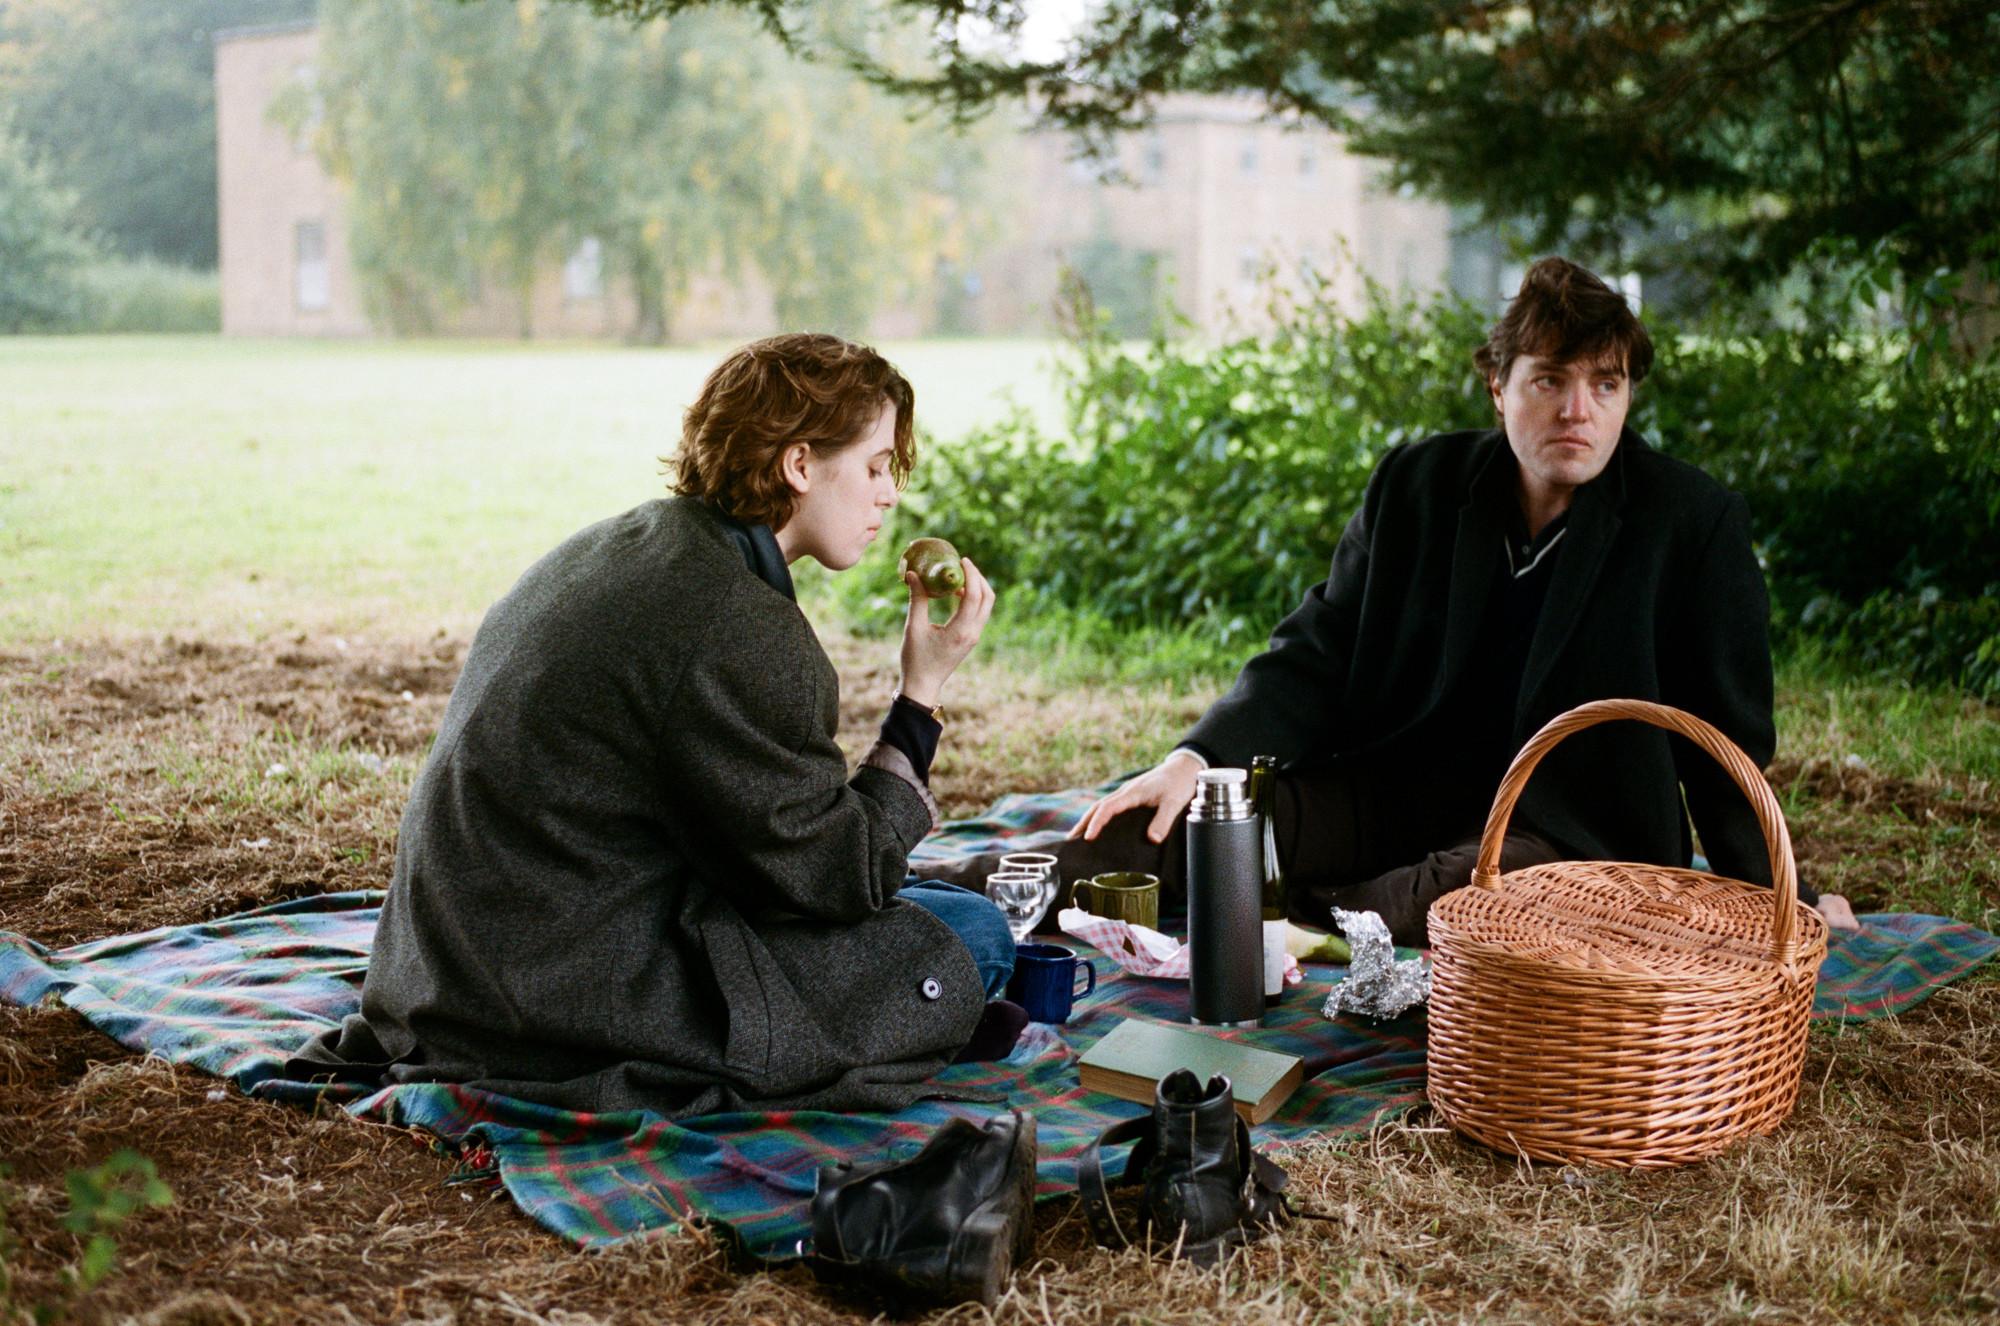 Honor Swinton Byrne, left, and Tom Burke in a scene from